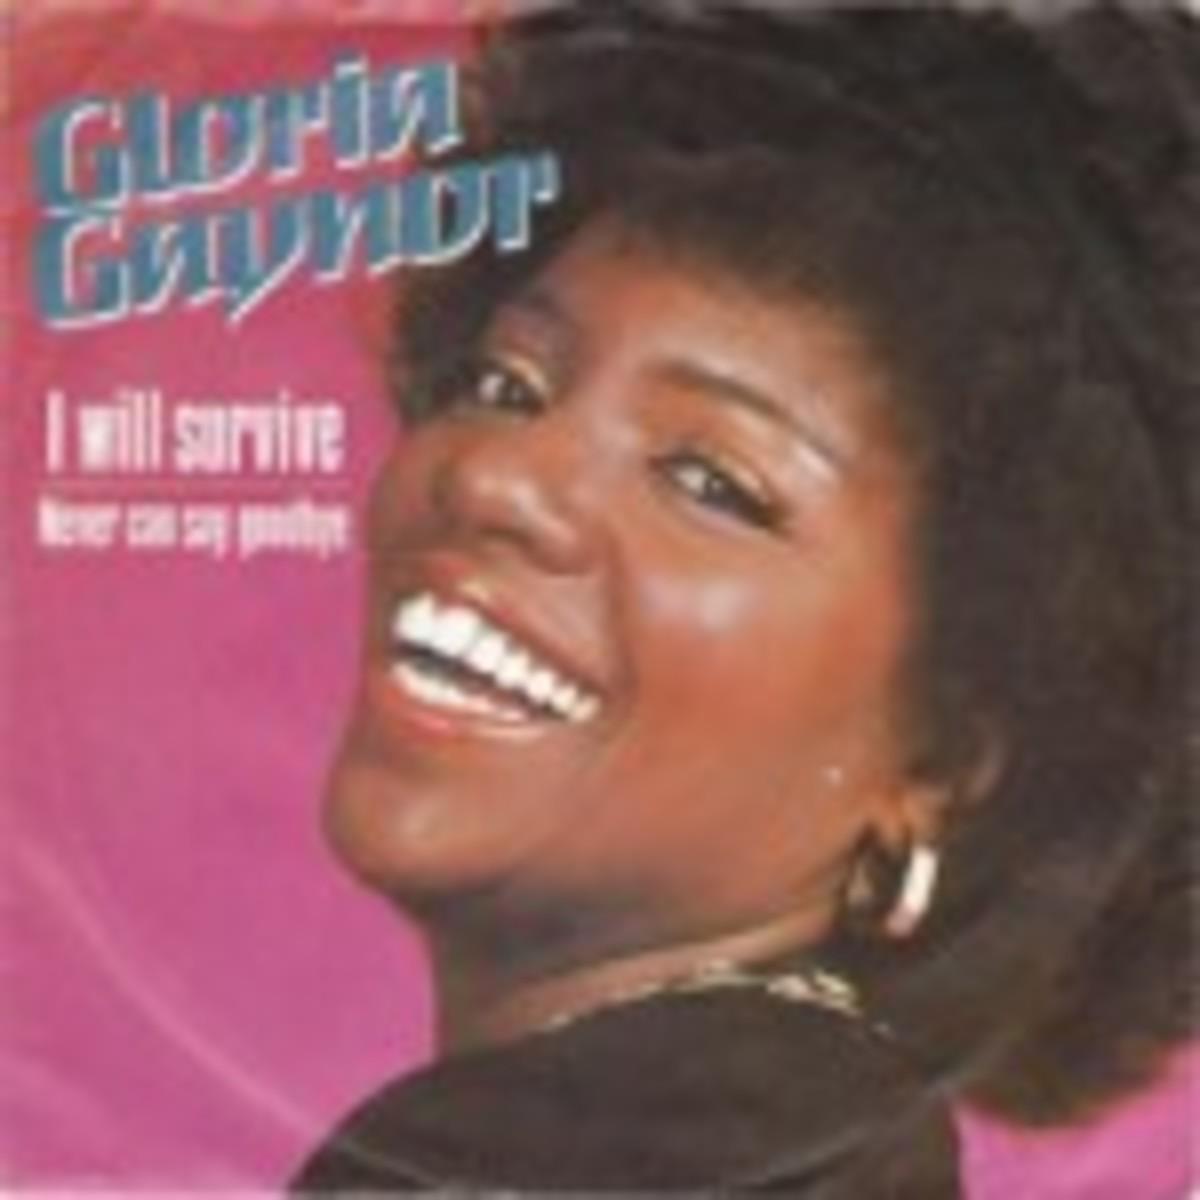 GloriaGaynor_IWillSurvive